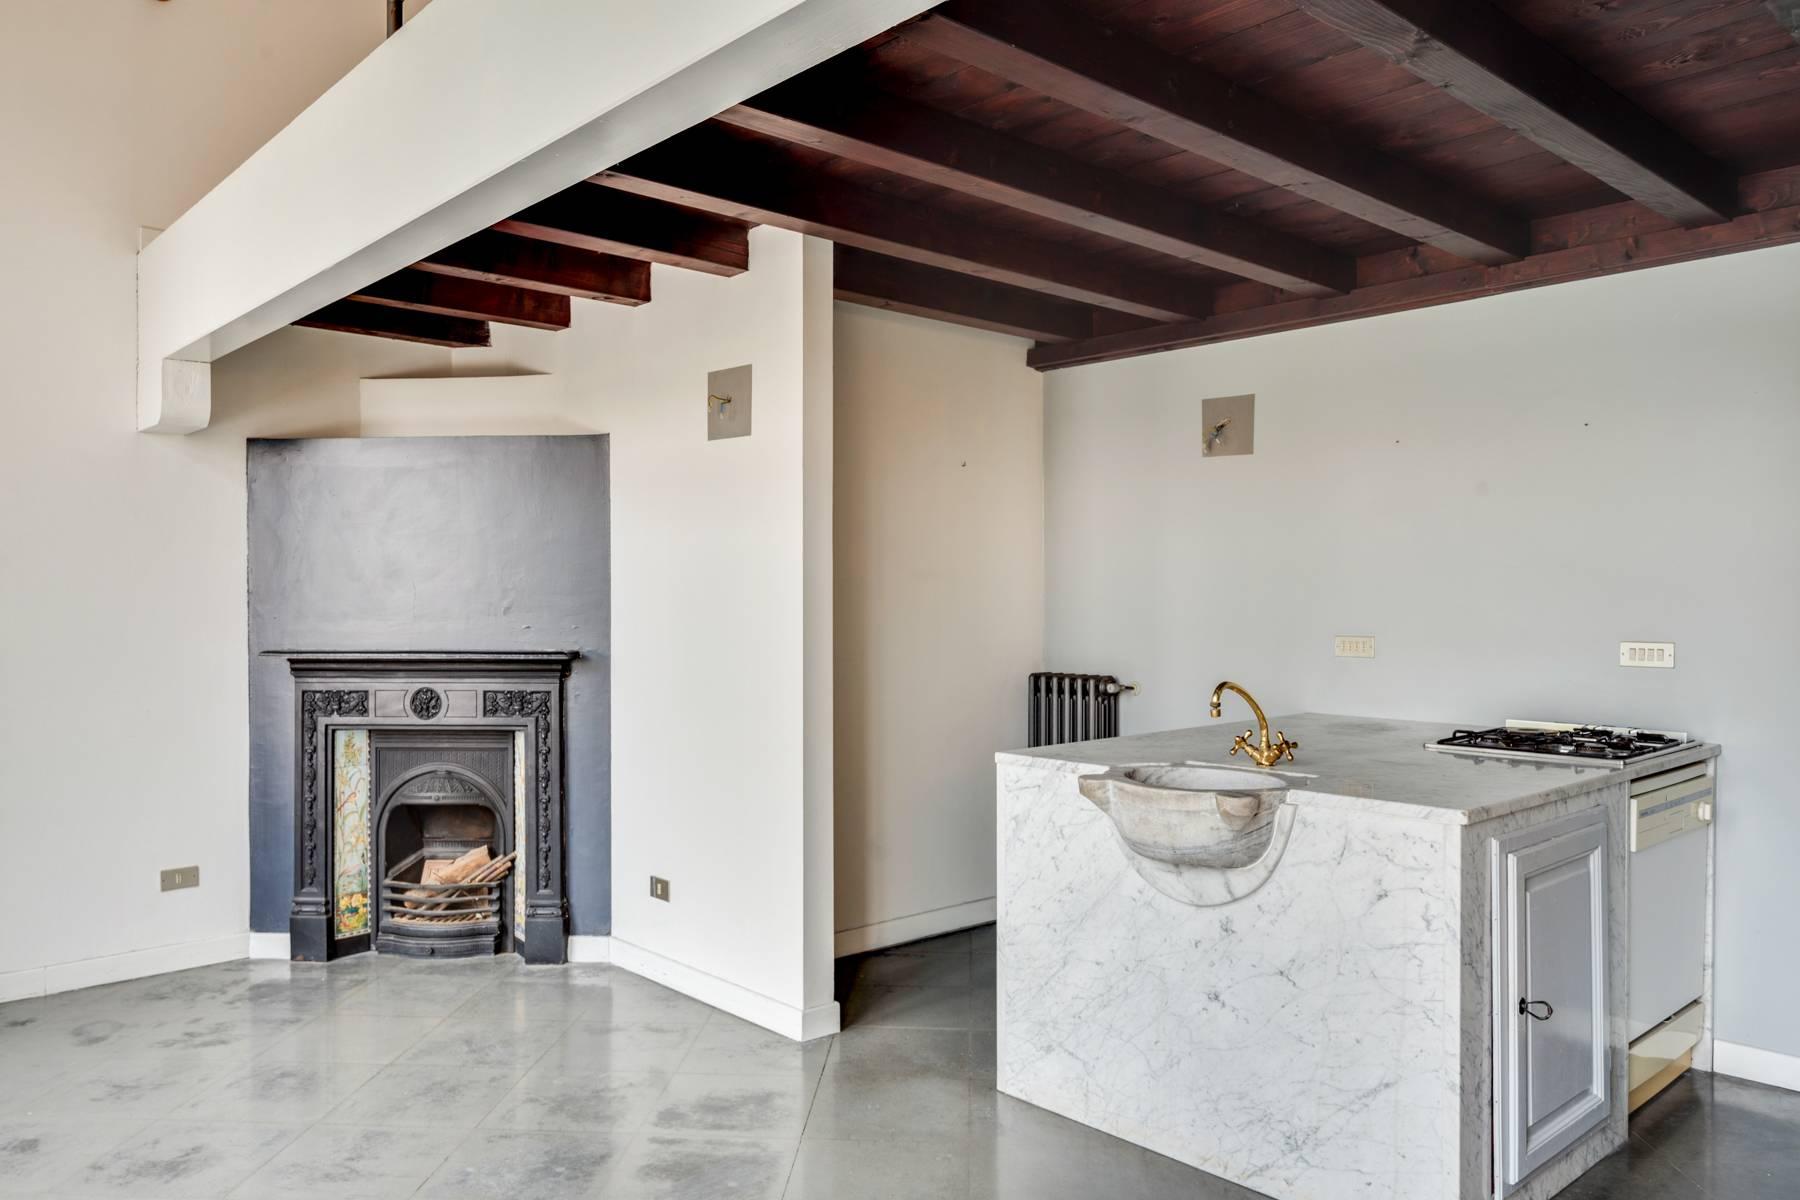 Appartamento in Vendita a Belgirate: 4 locali, 118 mq - Foto 12